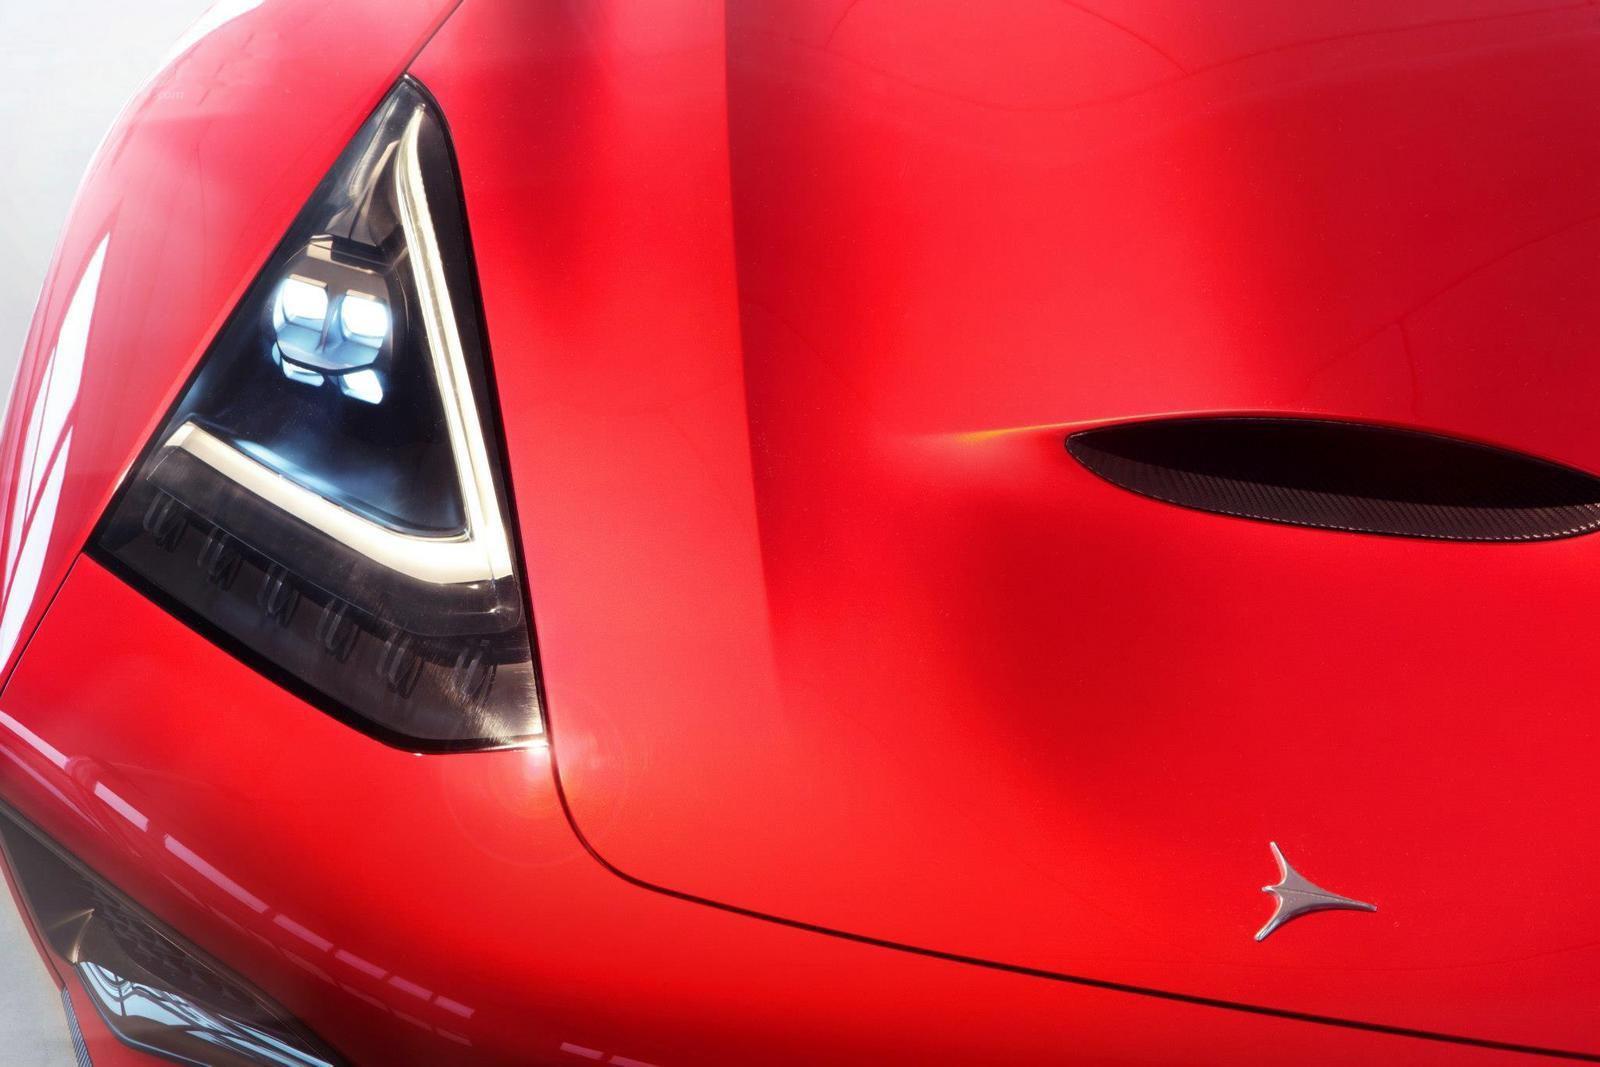 car i 2013 Icona Vulcano Concept